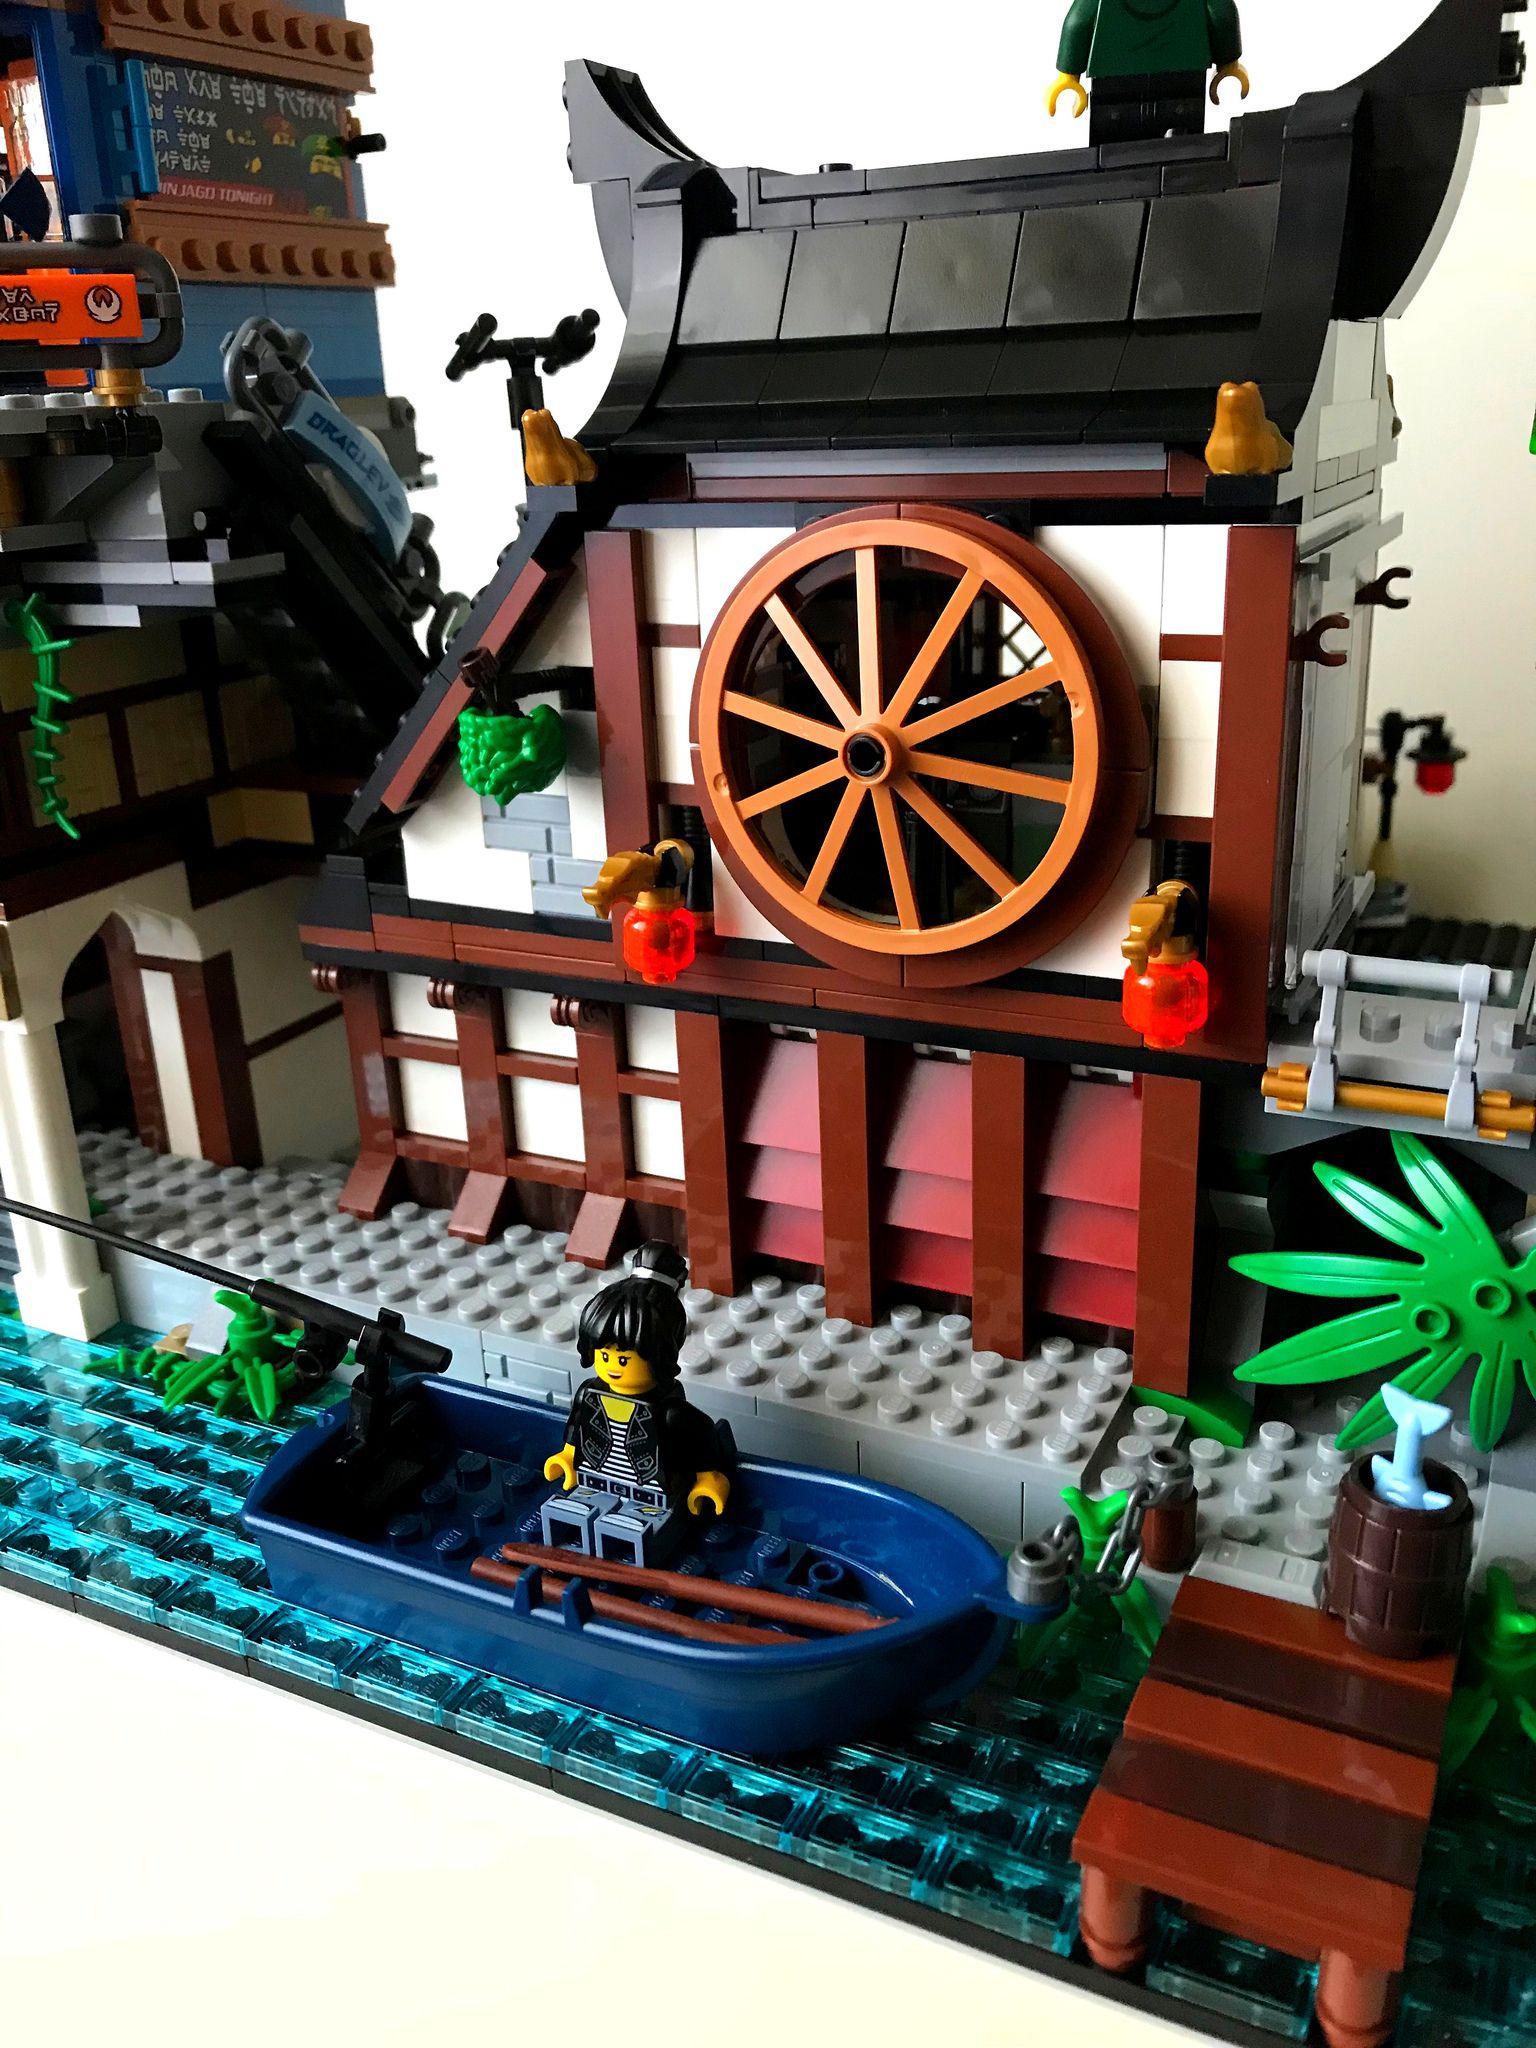 Ninjago City Docks Ninjago Lego Instructions Lego Ninjago Lego